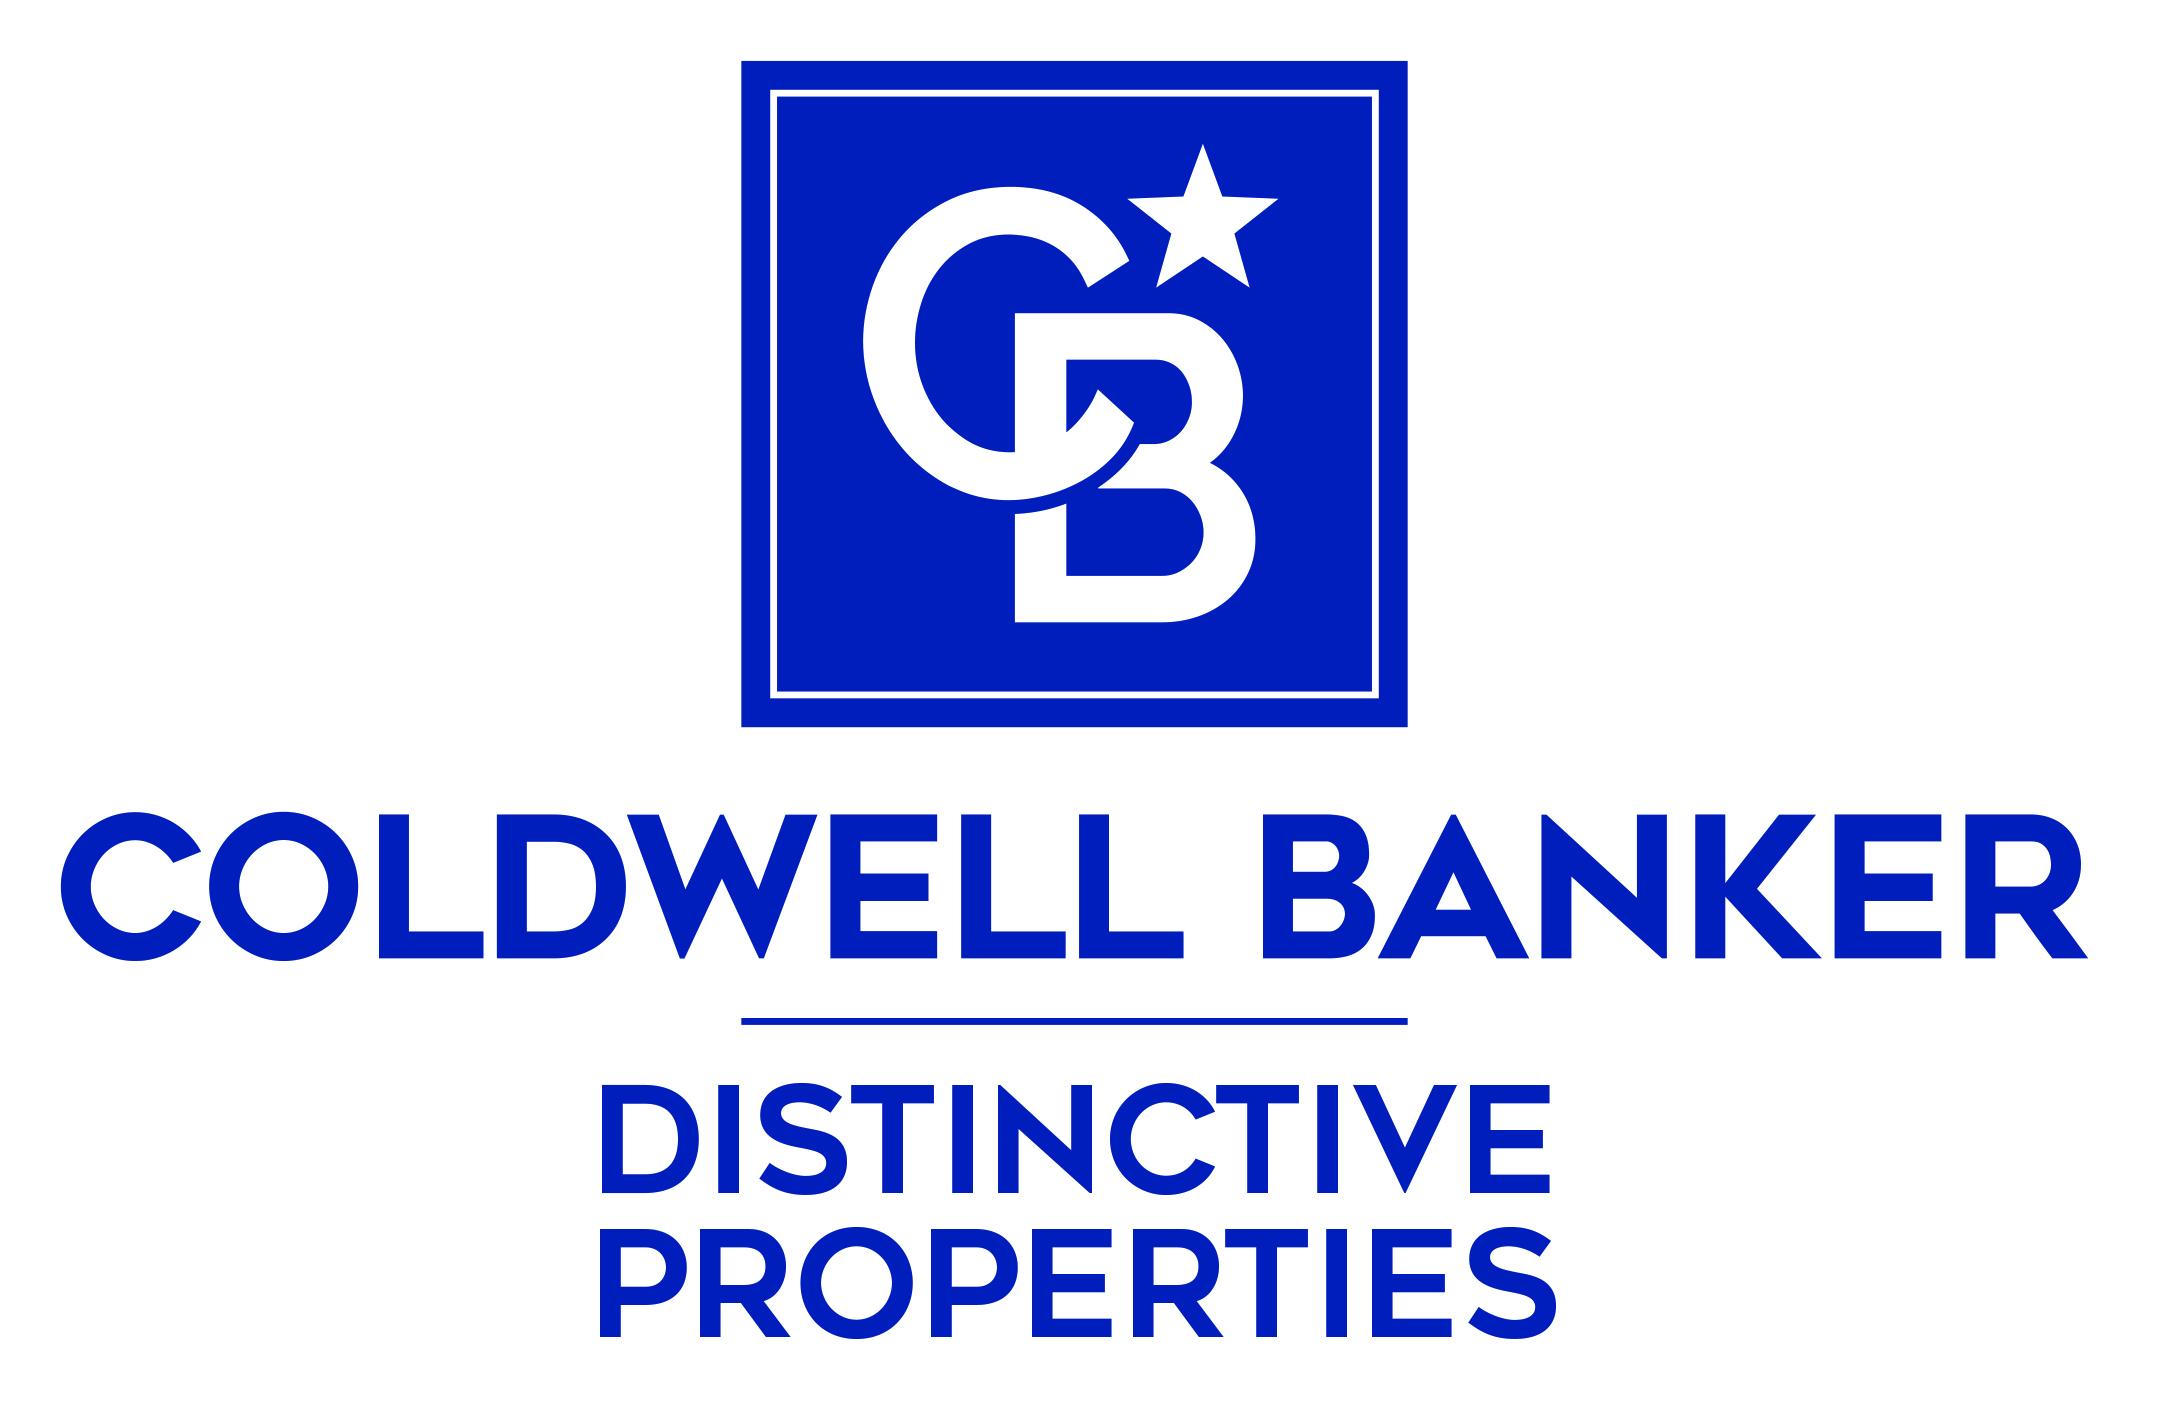 Coldwell Banker Grand Junction Properties Logo